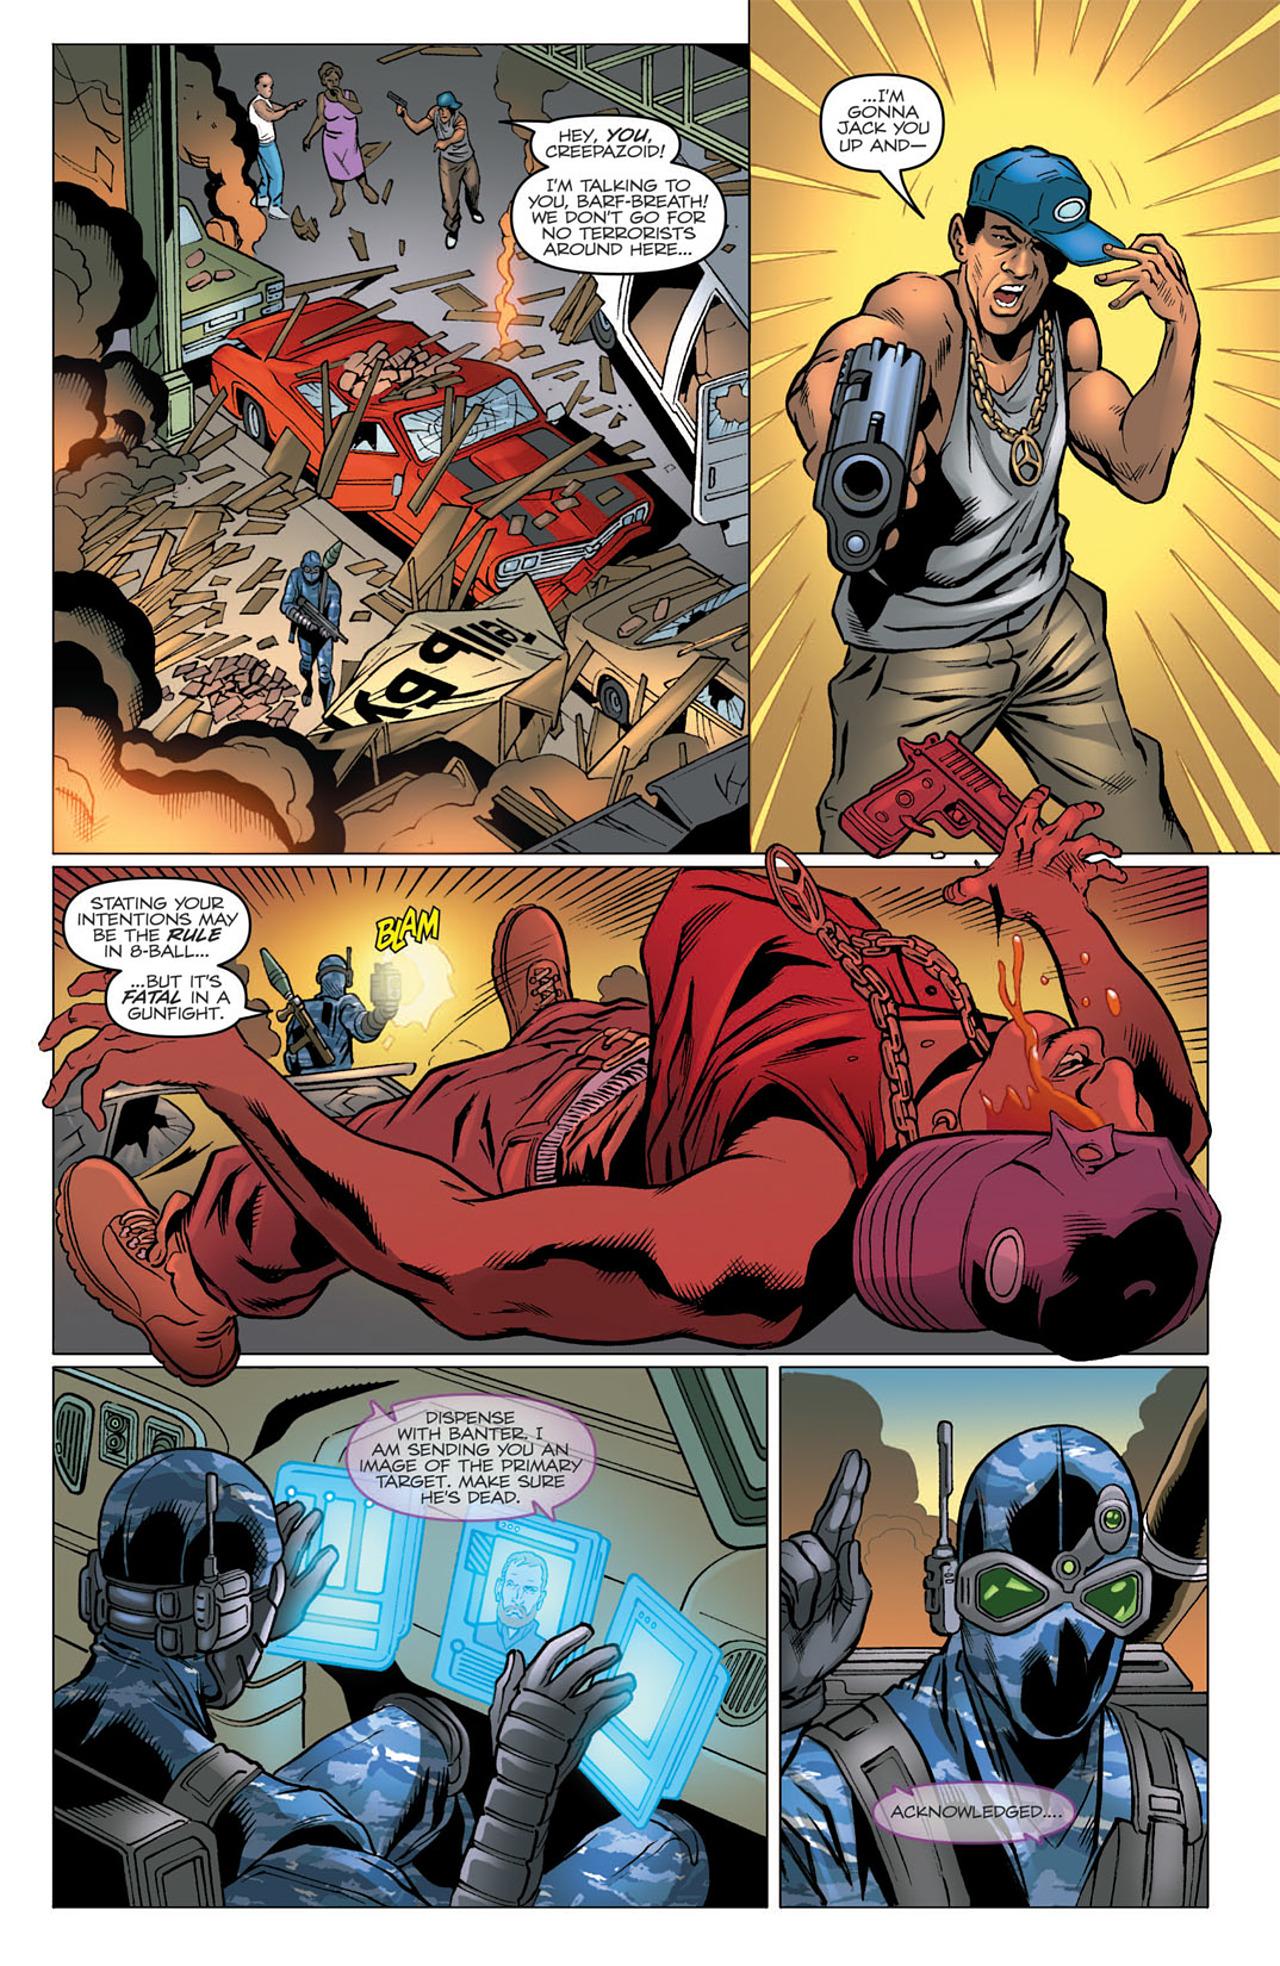 G.I. Joe: A Real American Hero 172 Page 5